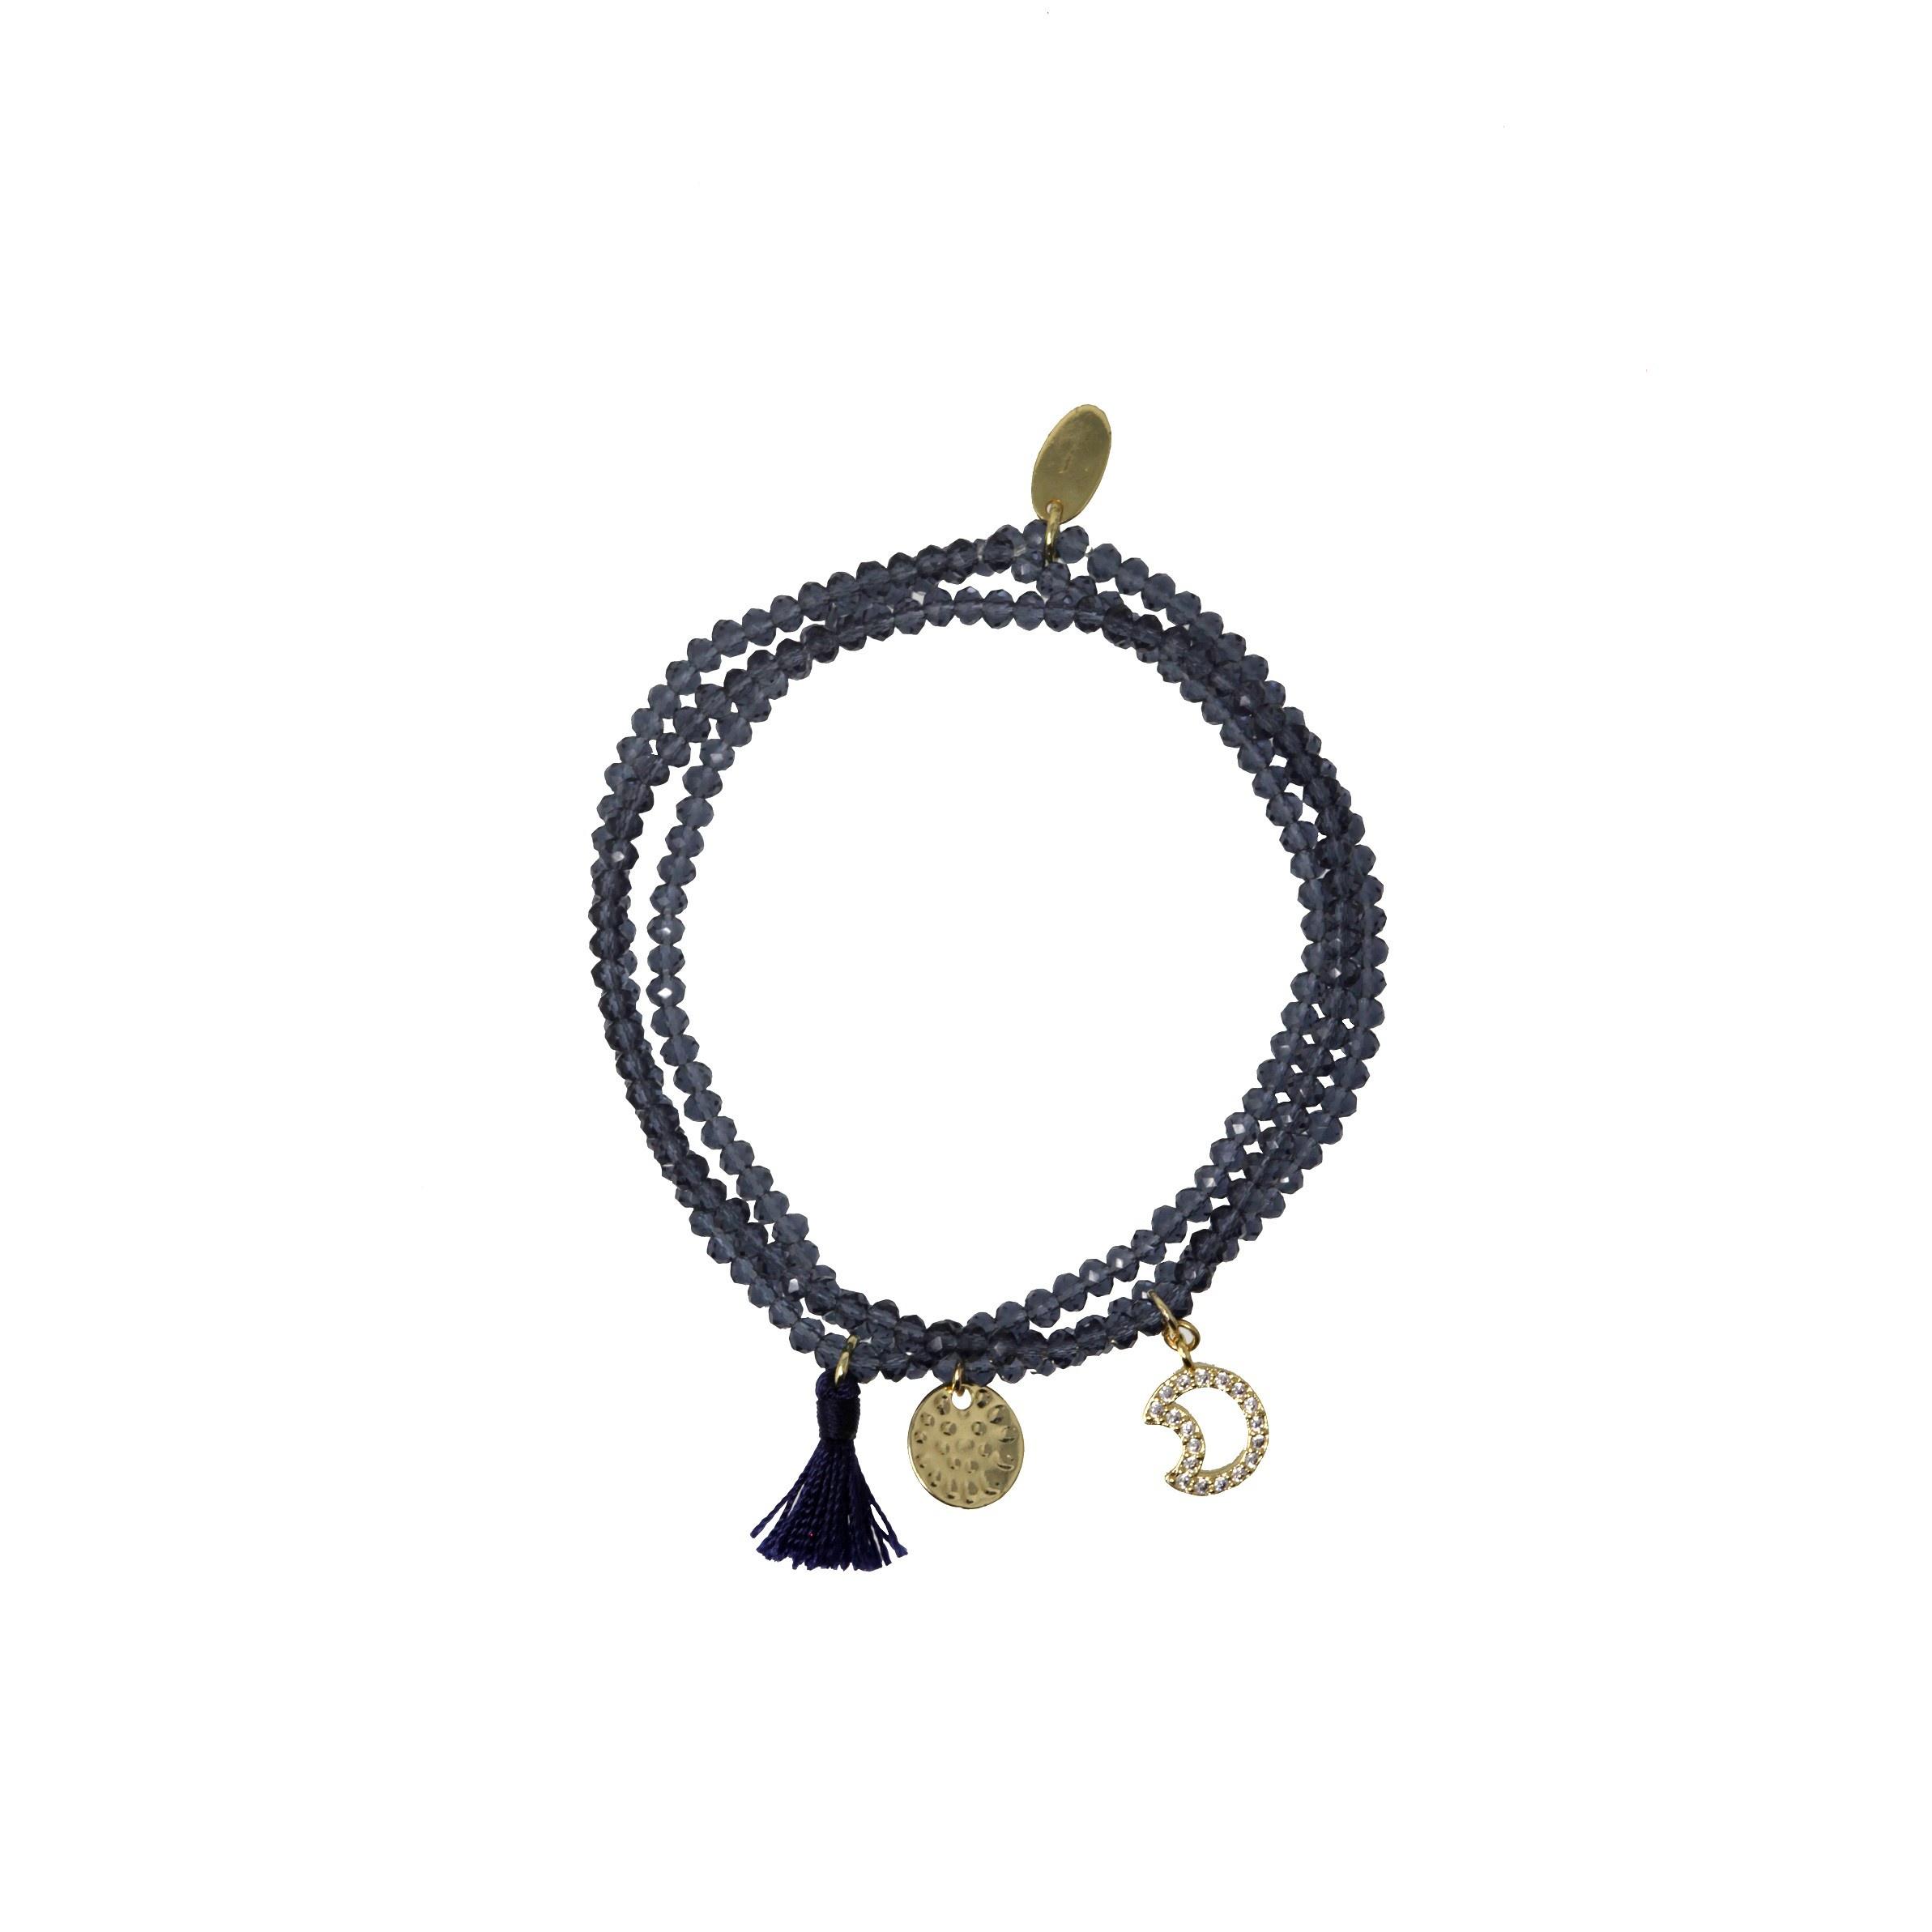 Treasure Moon Charm Bracelet by Ashiana London